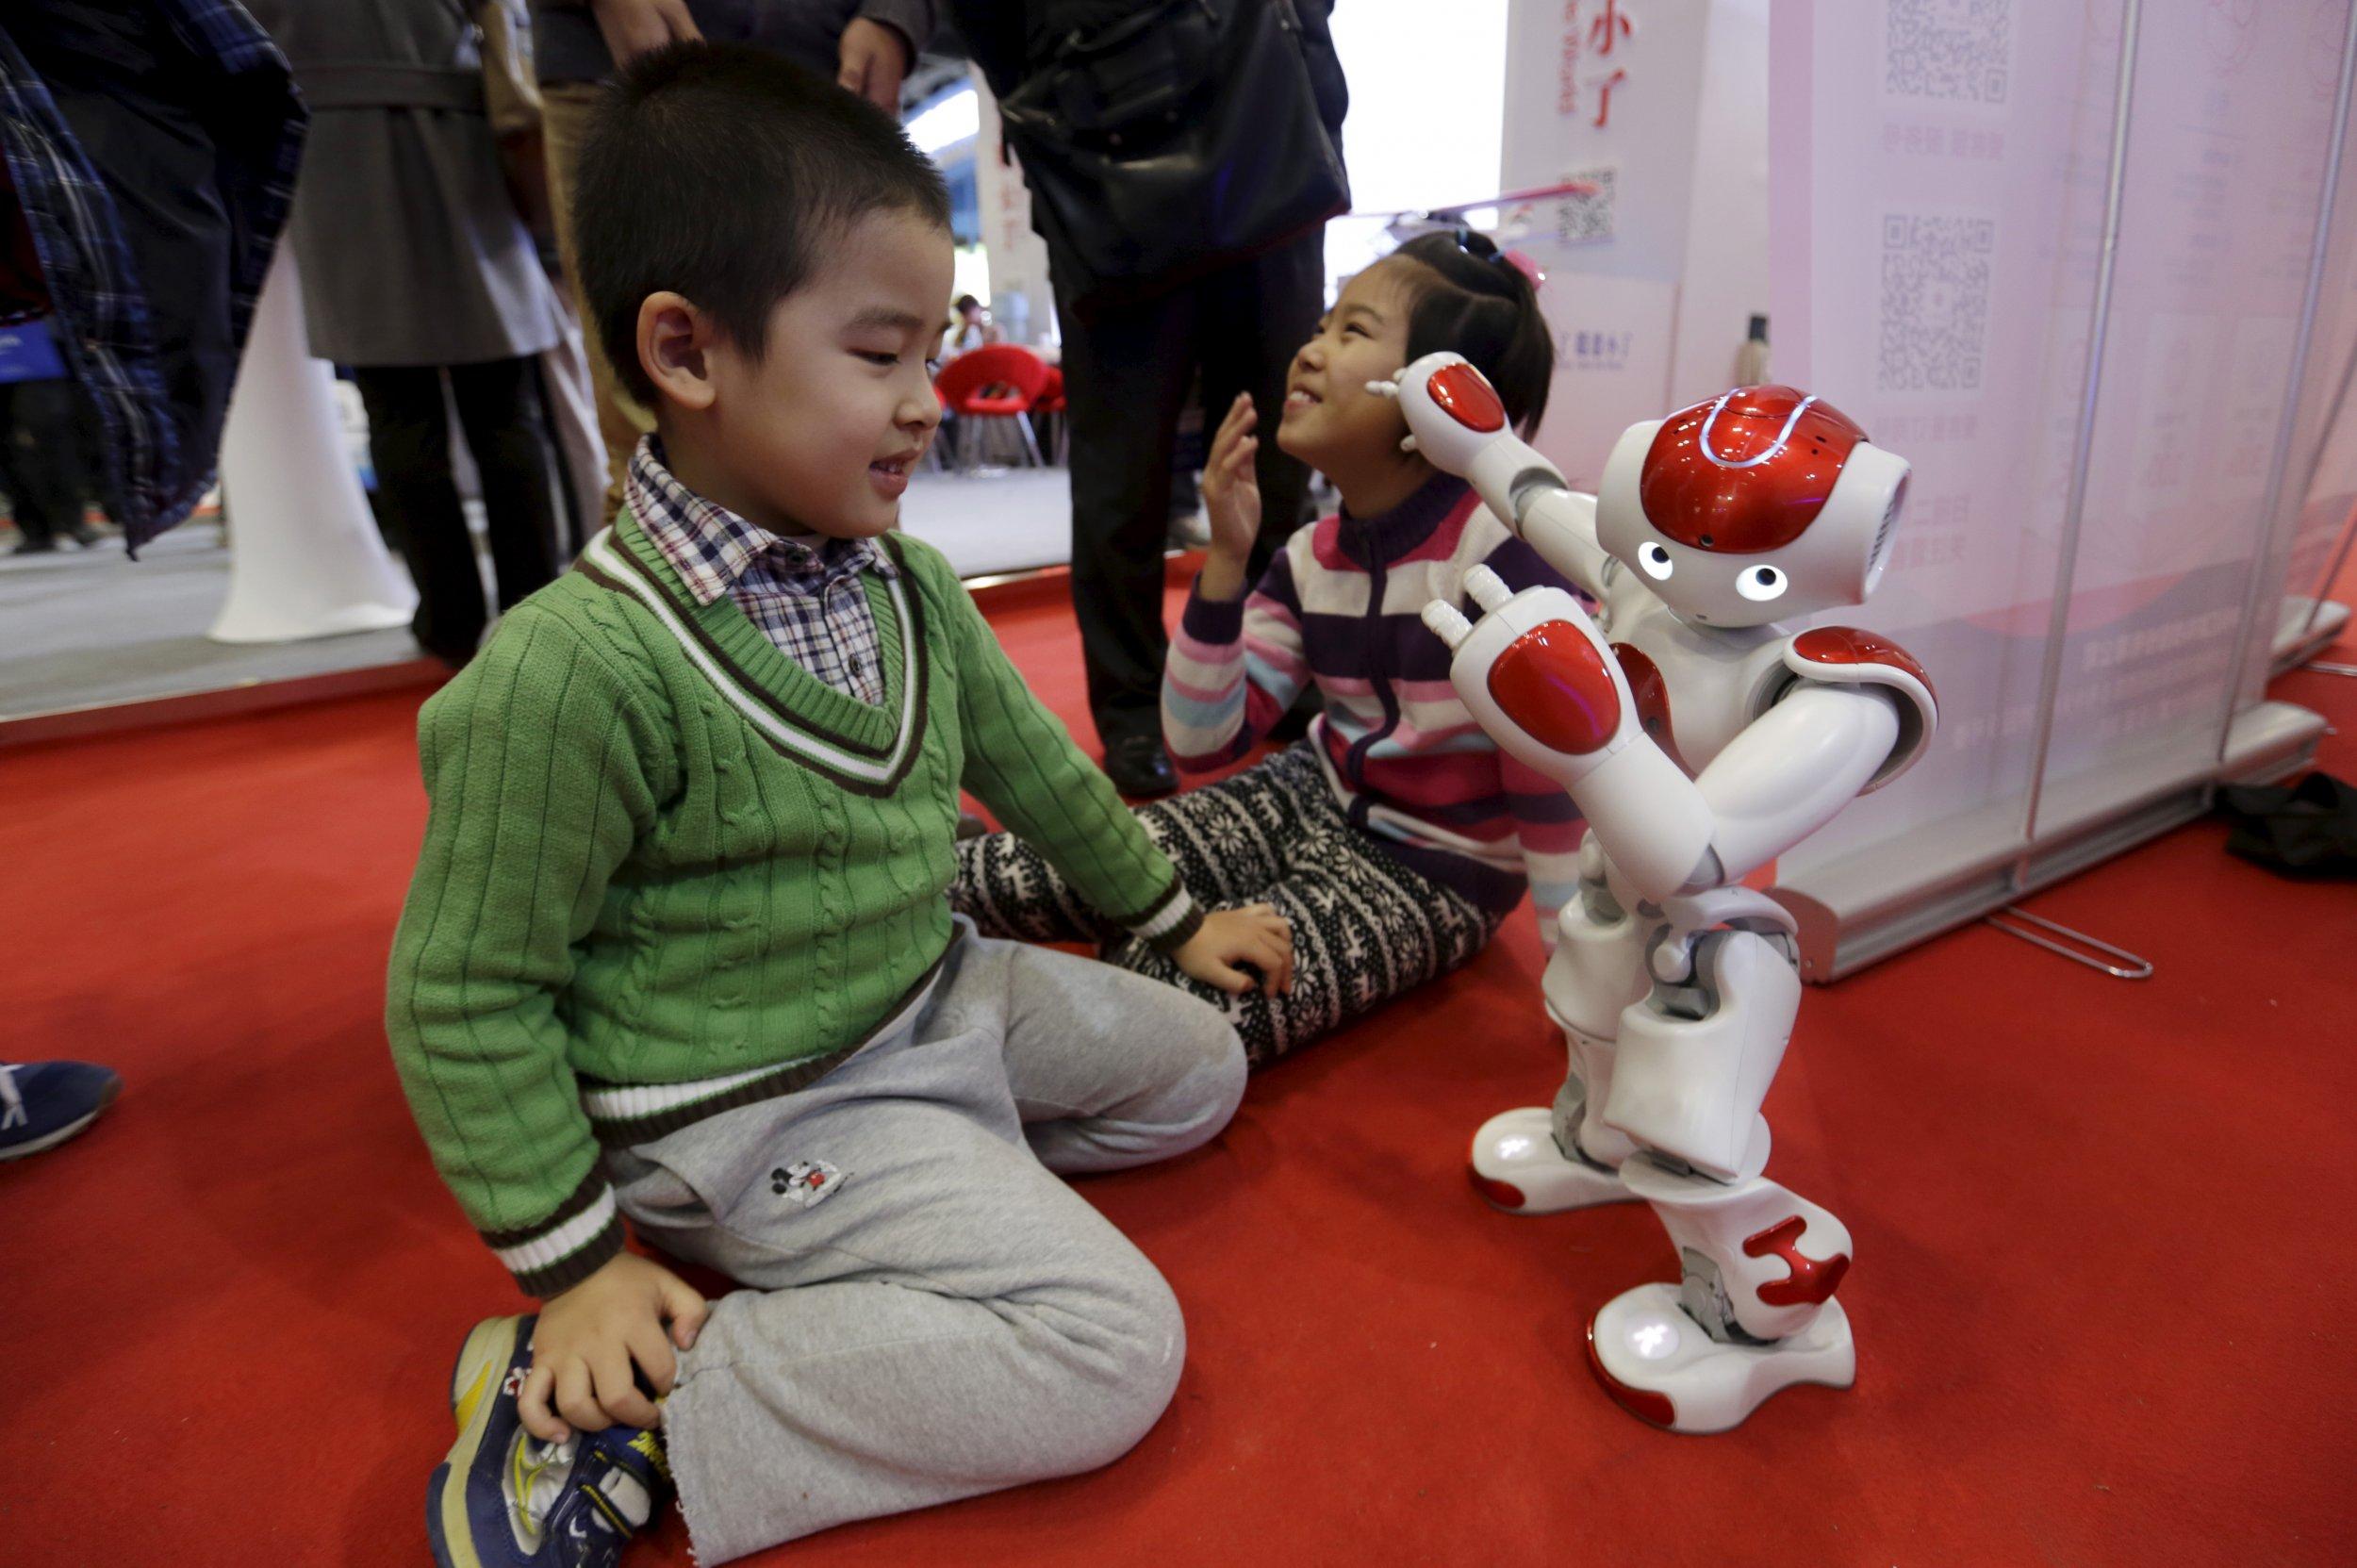 12_24_Refugee_NAO_Robot_01